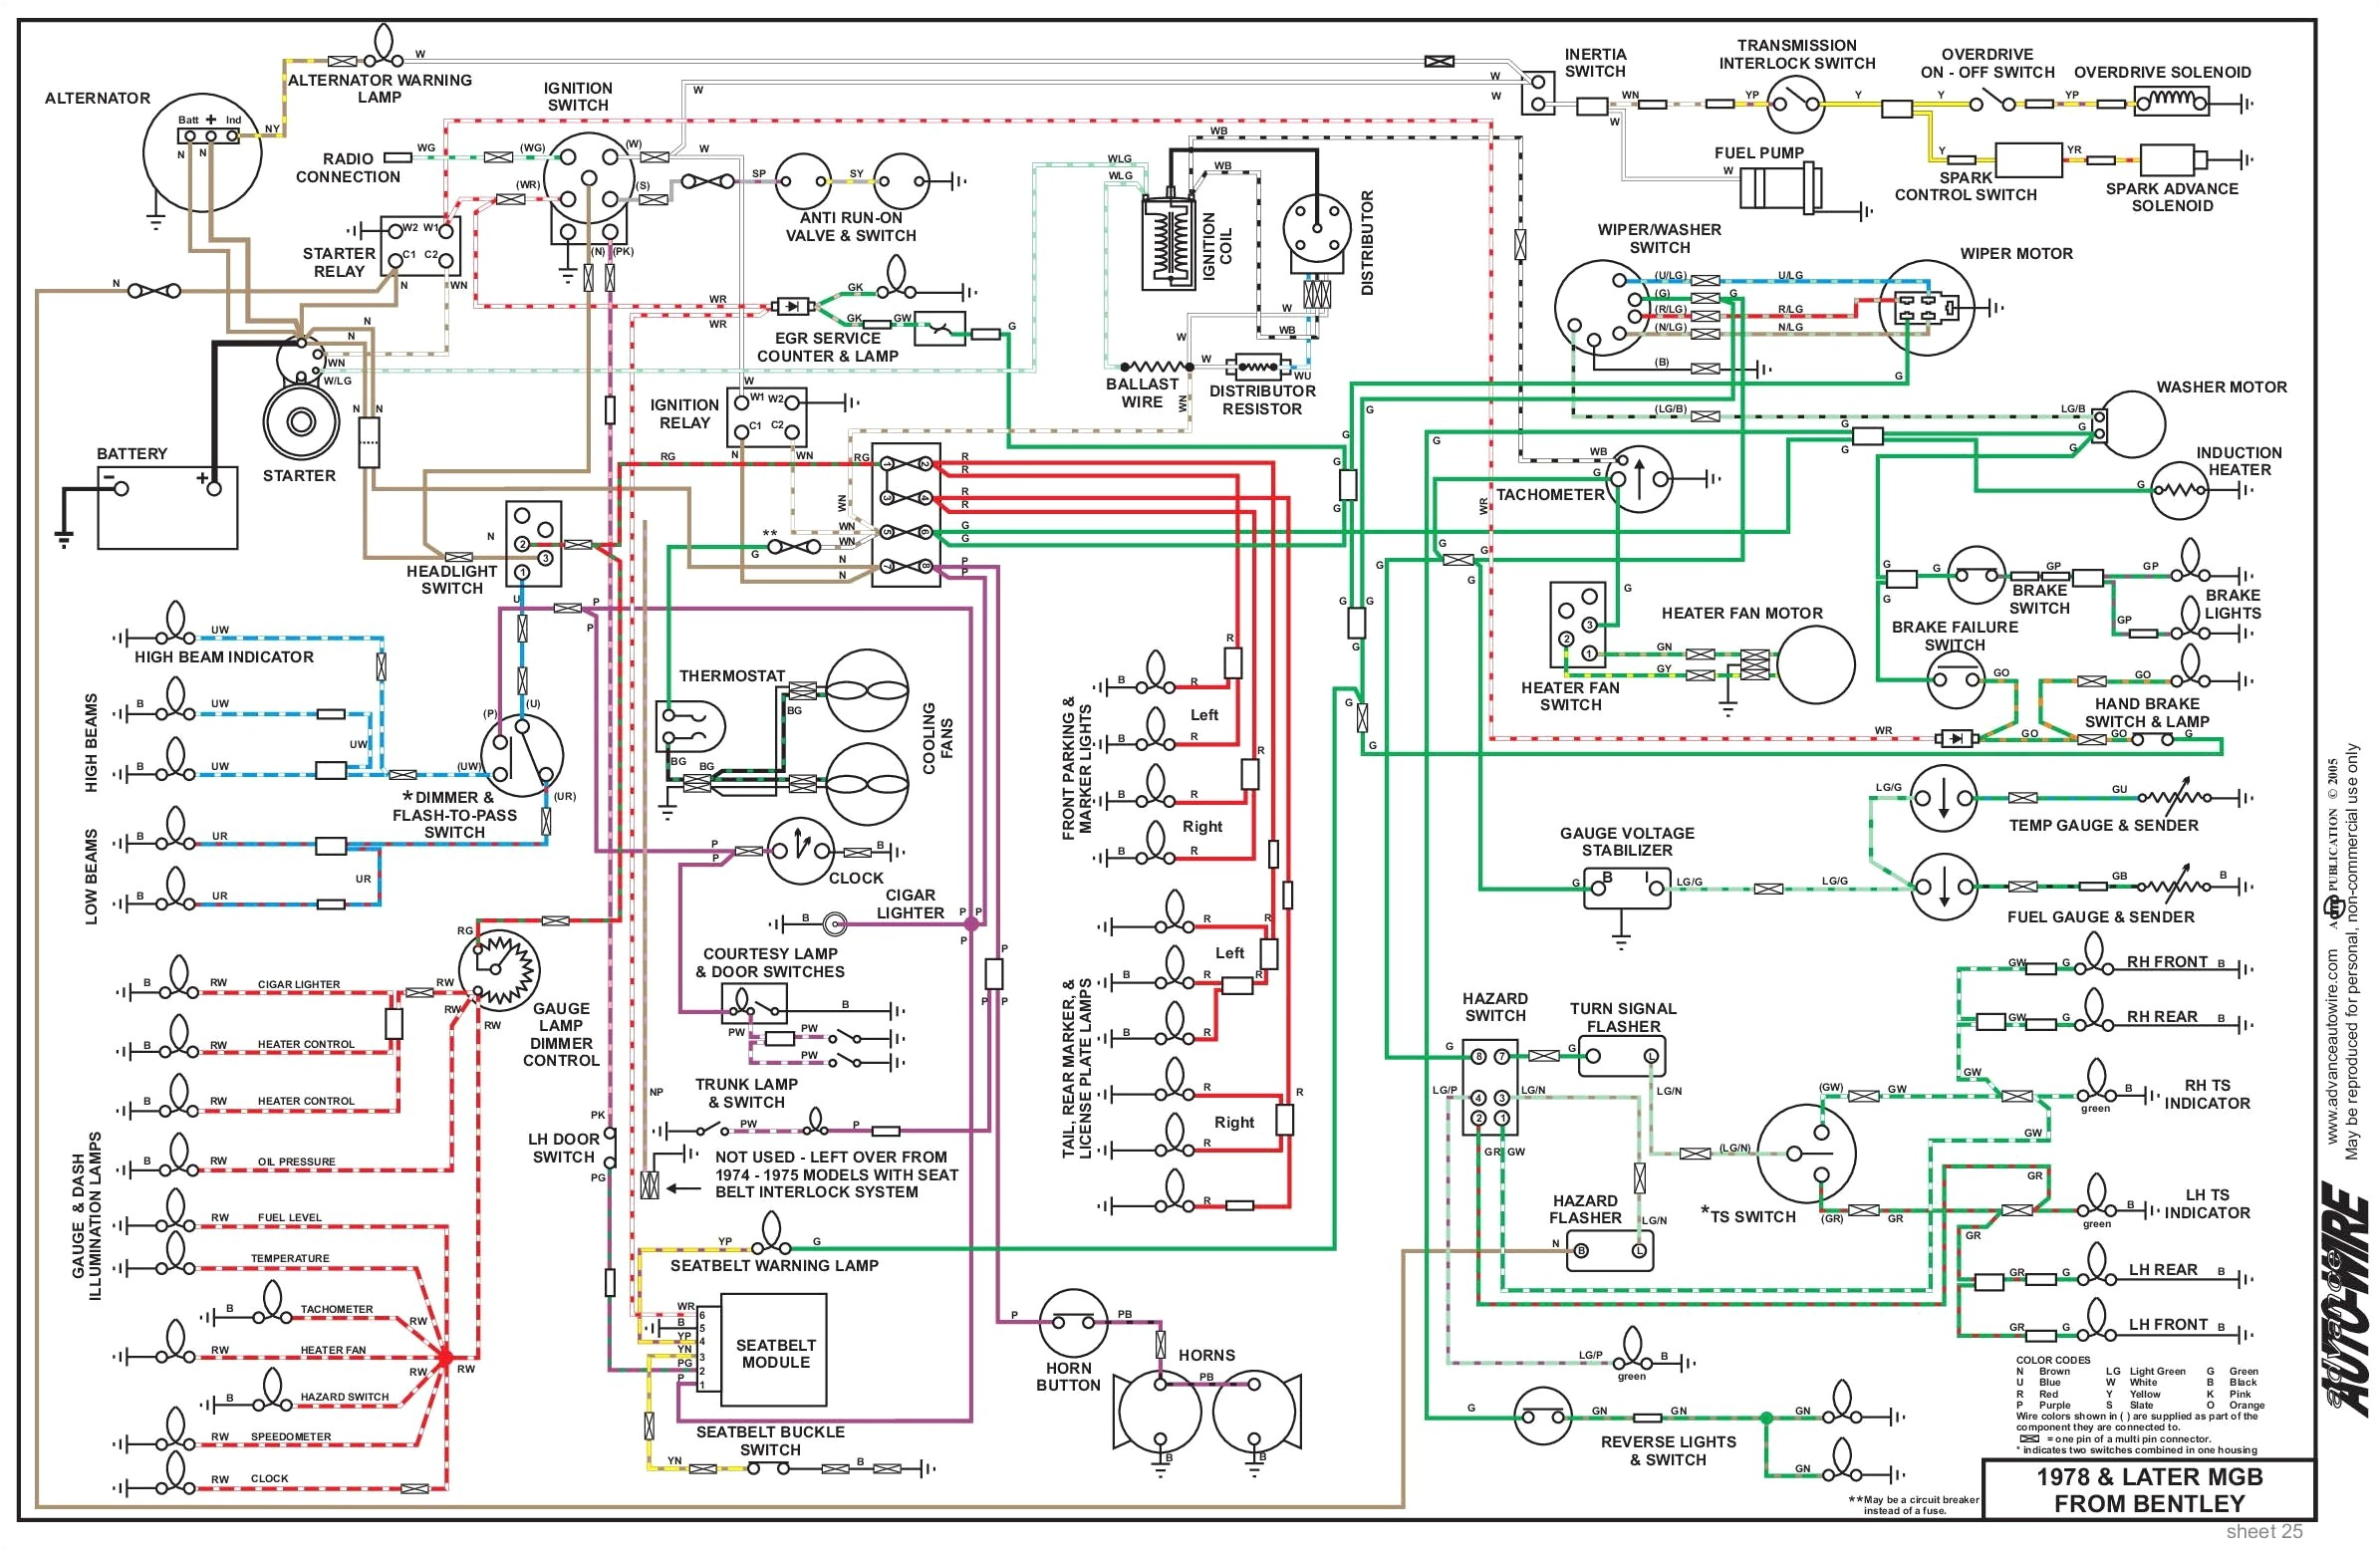 mgb gt wiring diagram wiring diagram expert mix 1976 mgb wiring diagram wiring diagram for you